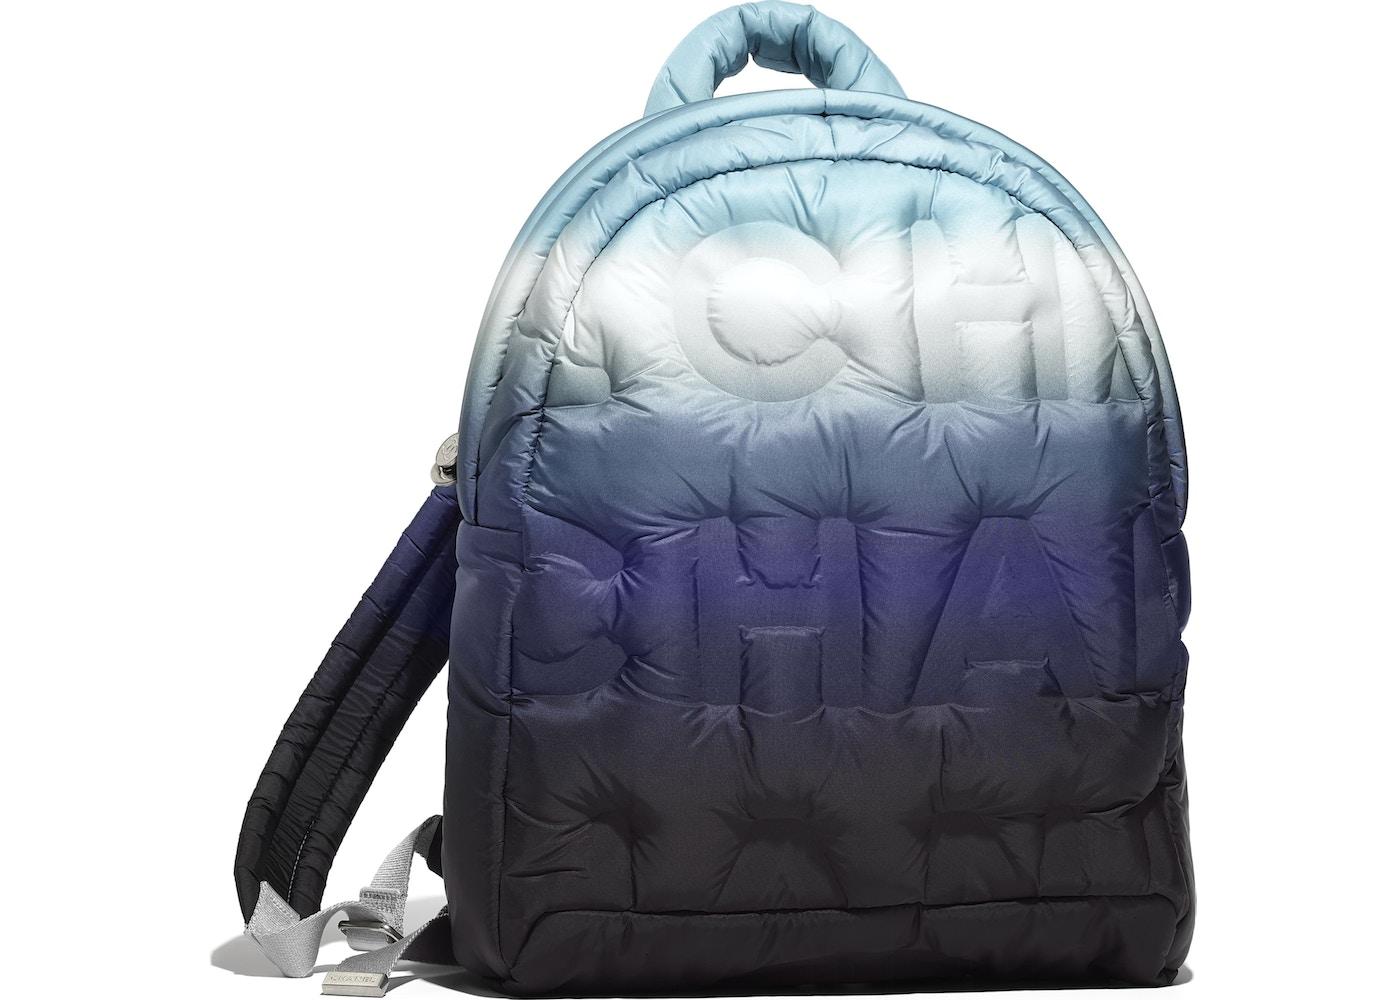 51373b9ad76c Chanel Doudoune Backpack Embossed Black/Blue/White. Embossed  Black/Blue/White